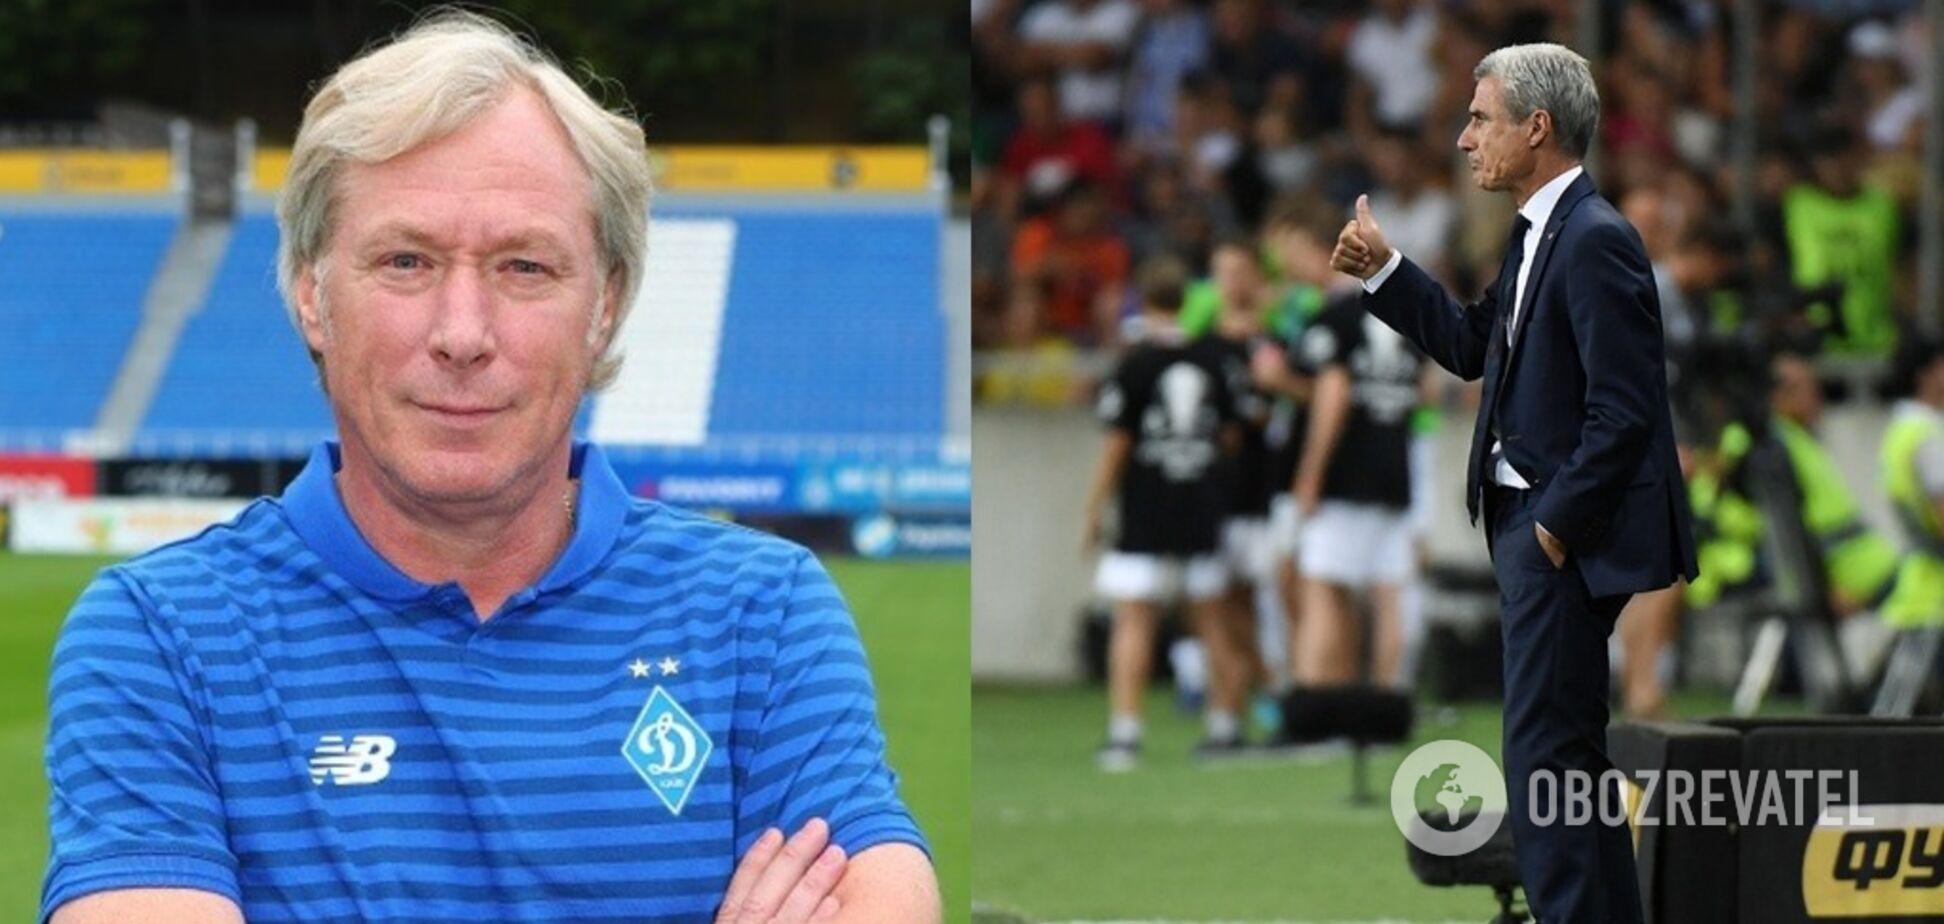 'Динамо' и 'Шахтер' нацелились на одного и того же тренера – СМИ